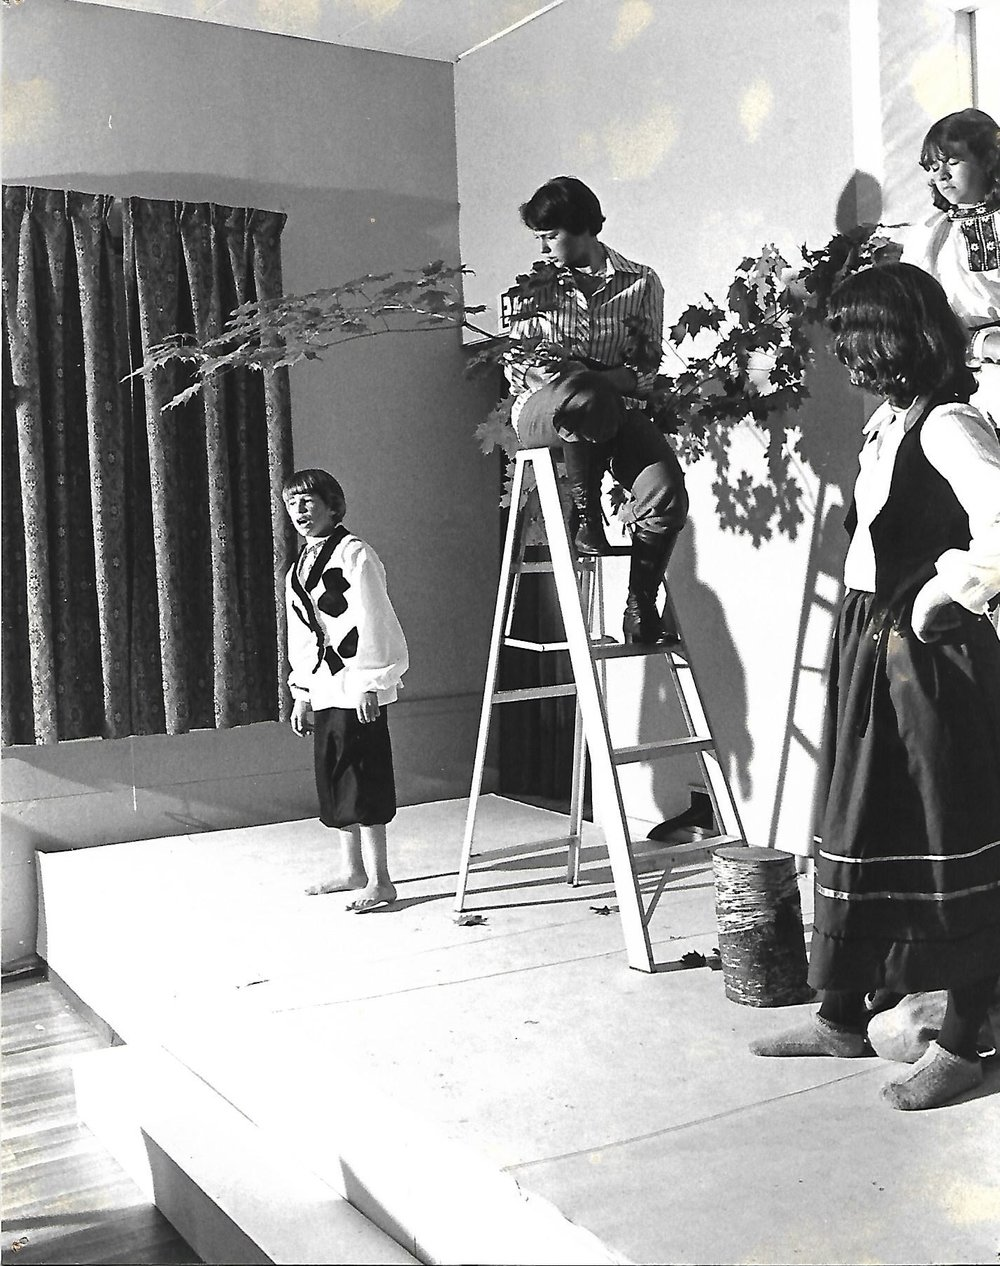 (Left to Right) James Short, Gretchen Forsby, Donna Parber, Alison Gannett